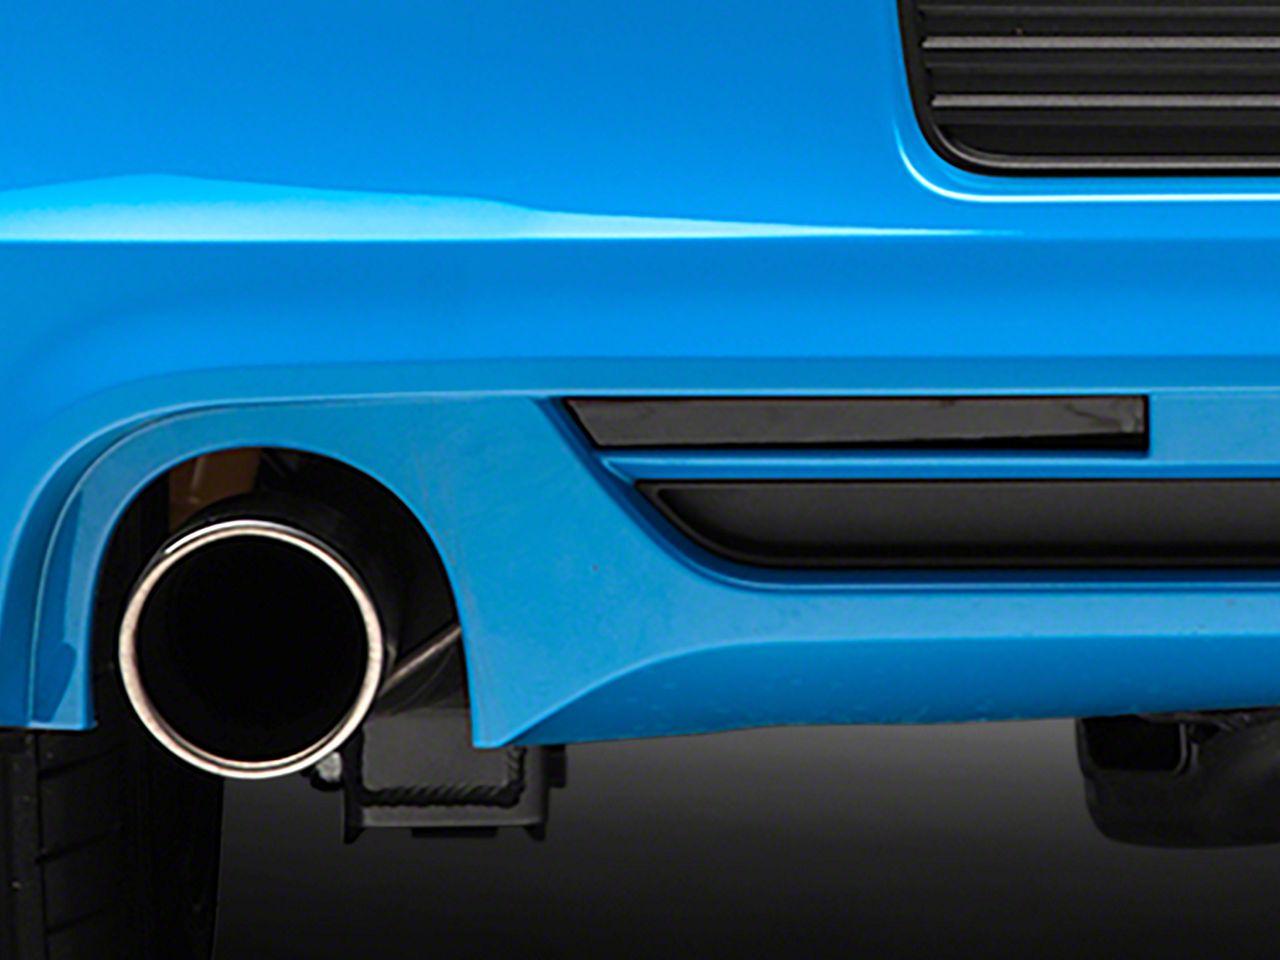 Add Smoked Rear Bumper Marker Tint